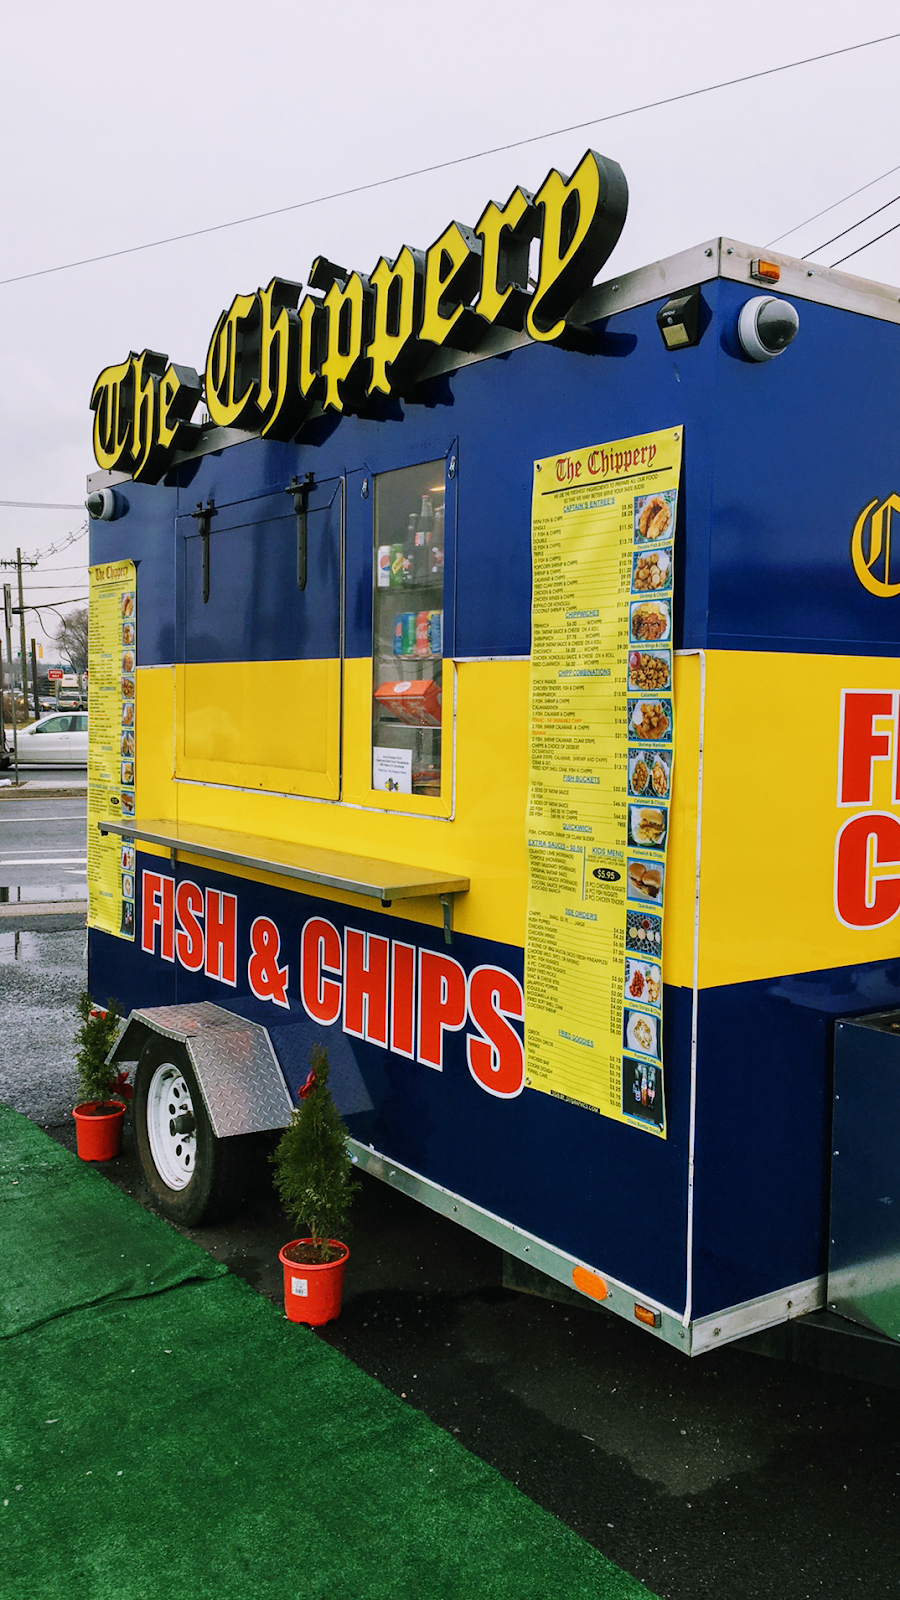 The Chippery - restaurant  | Photo 4 of 8 | Address: 156 Broadway, Jersey City, NJ 07306, USA | Phone: (201) 893-4424